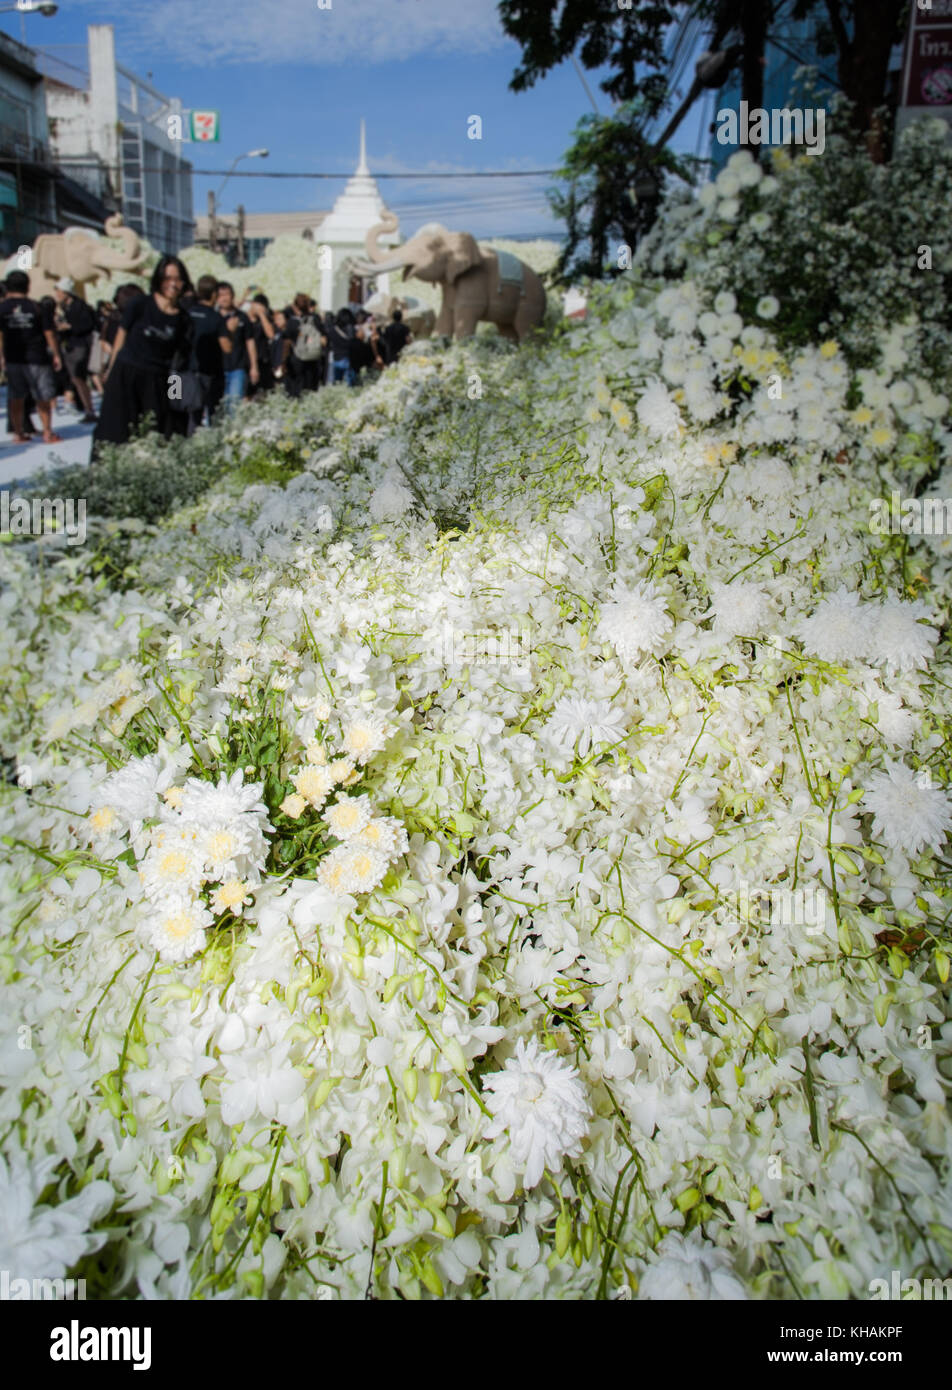 thailand bangkok orchid flowers stock photos u0026 thailand bangkok